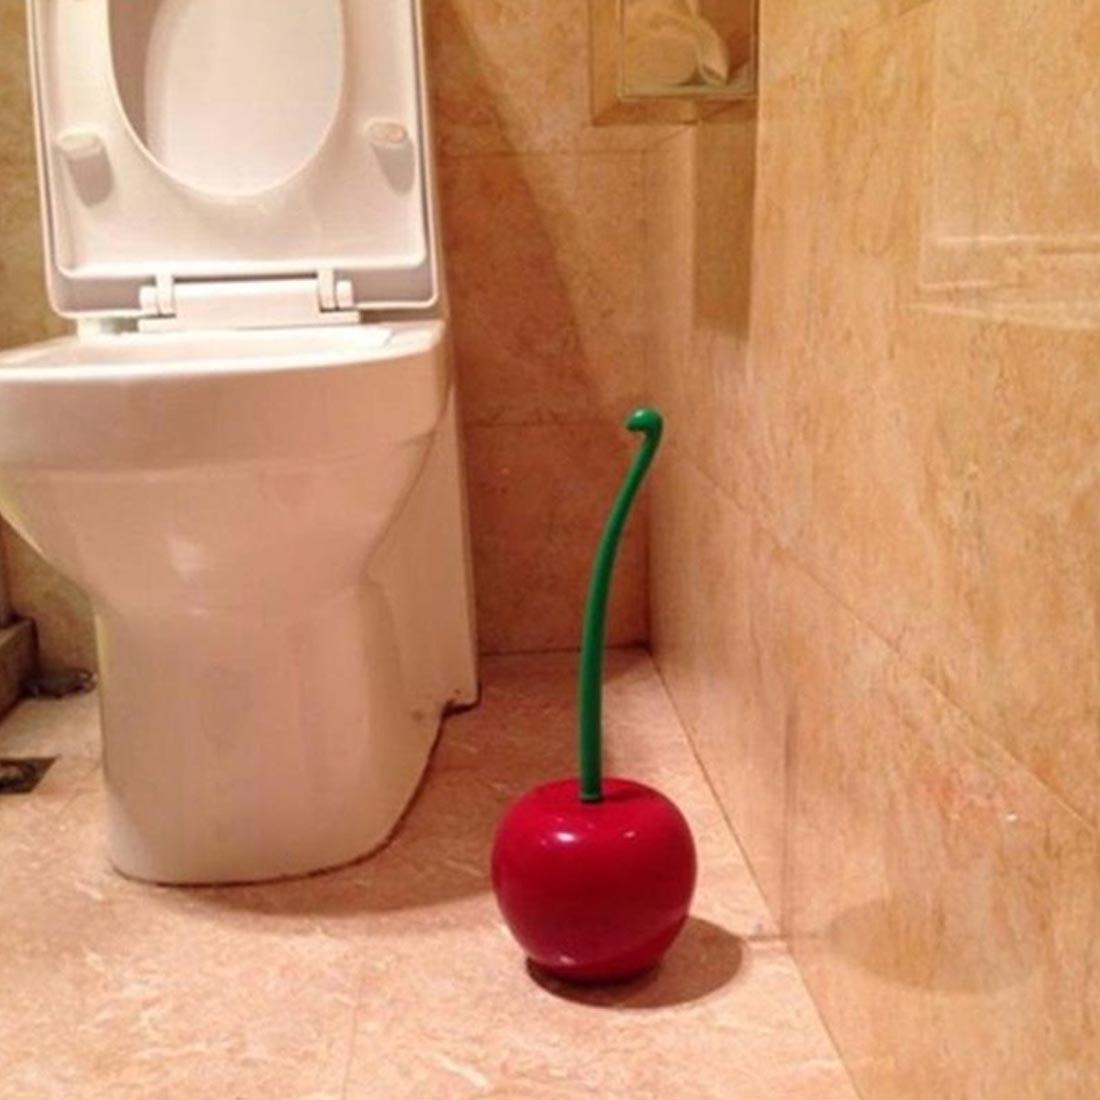 Excellent Bathroom Toilet Brush Creative Lovely Cherry Shape Lavatory Brush Toilet Brush And Holder Set Move Cherry 380x130mm